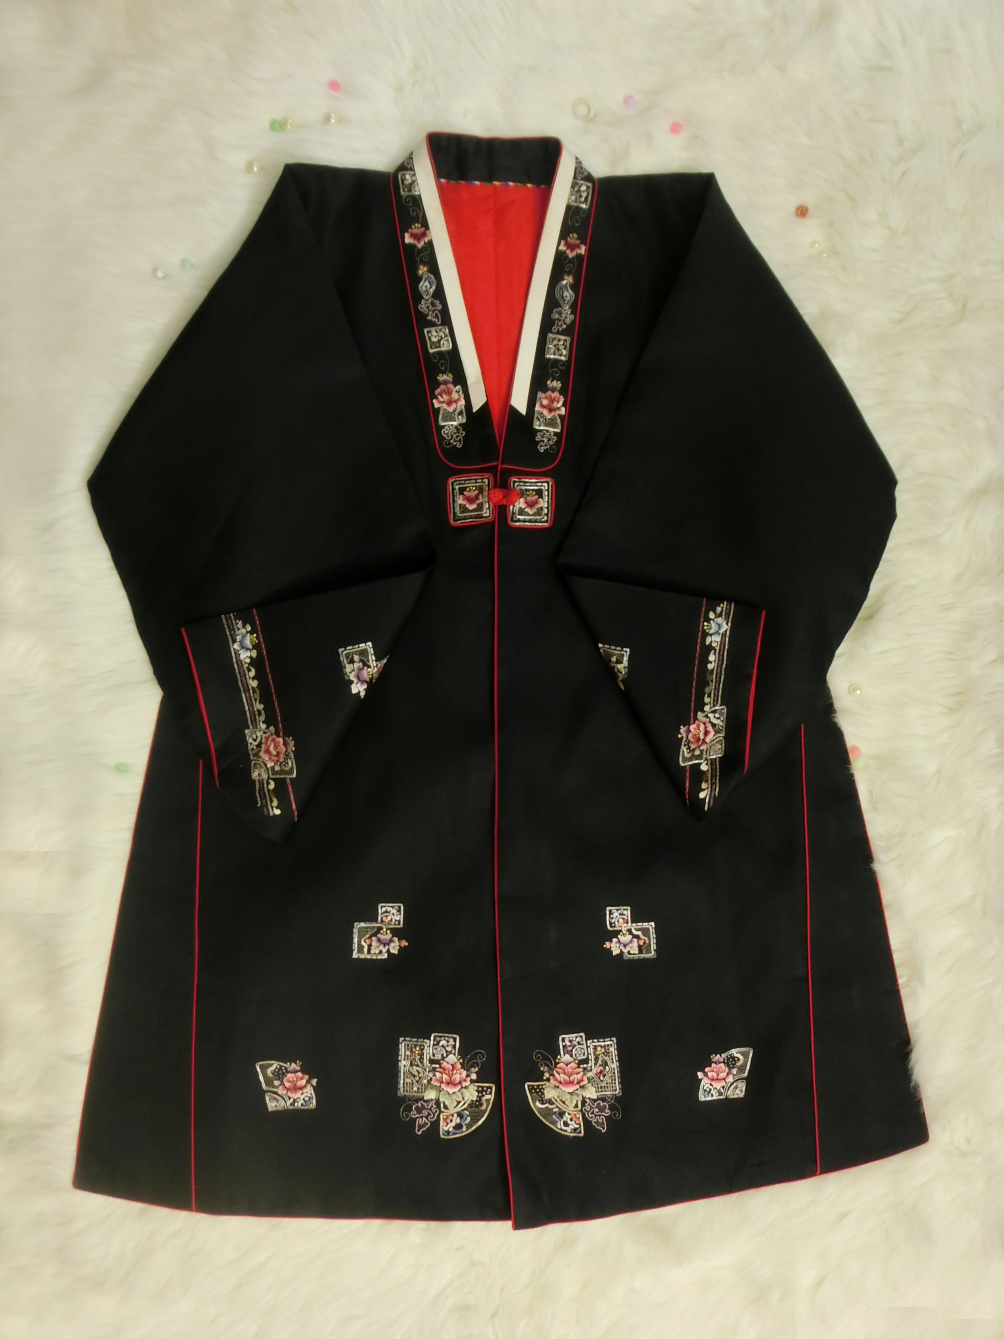 Hanbok (DURUMAGI) โค้ท สำหรับสวมทับชุดฮันบกหญิง ไหมเกาหลีสีดำ ปักมือ